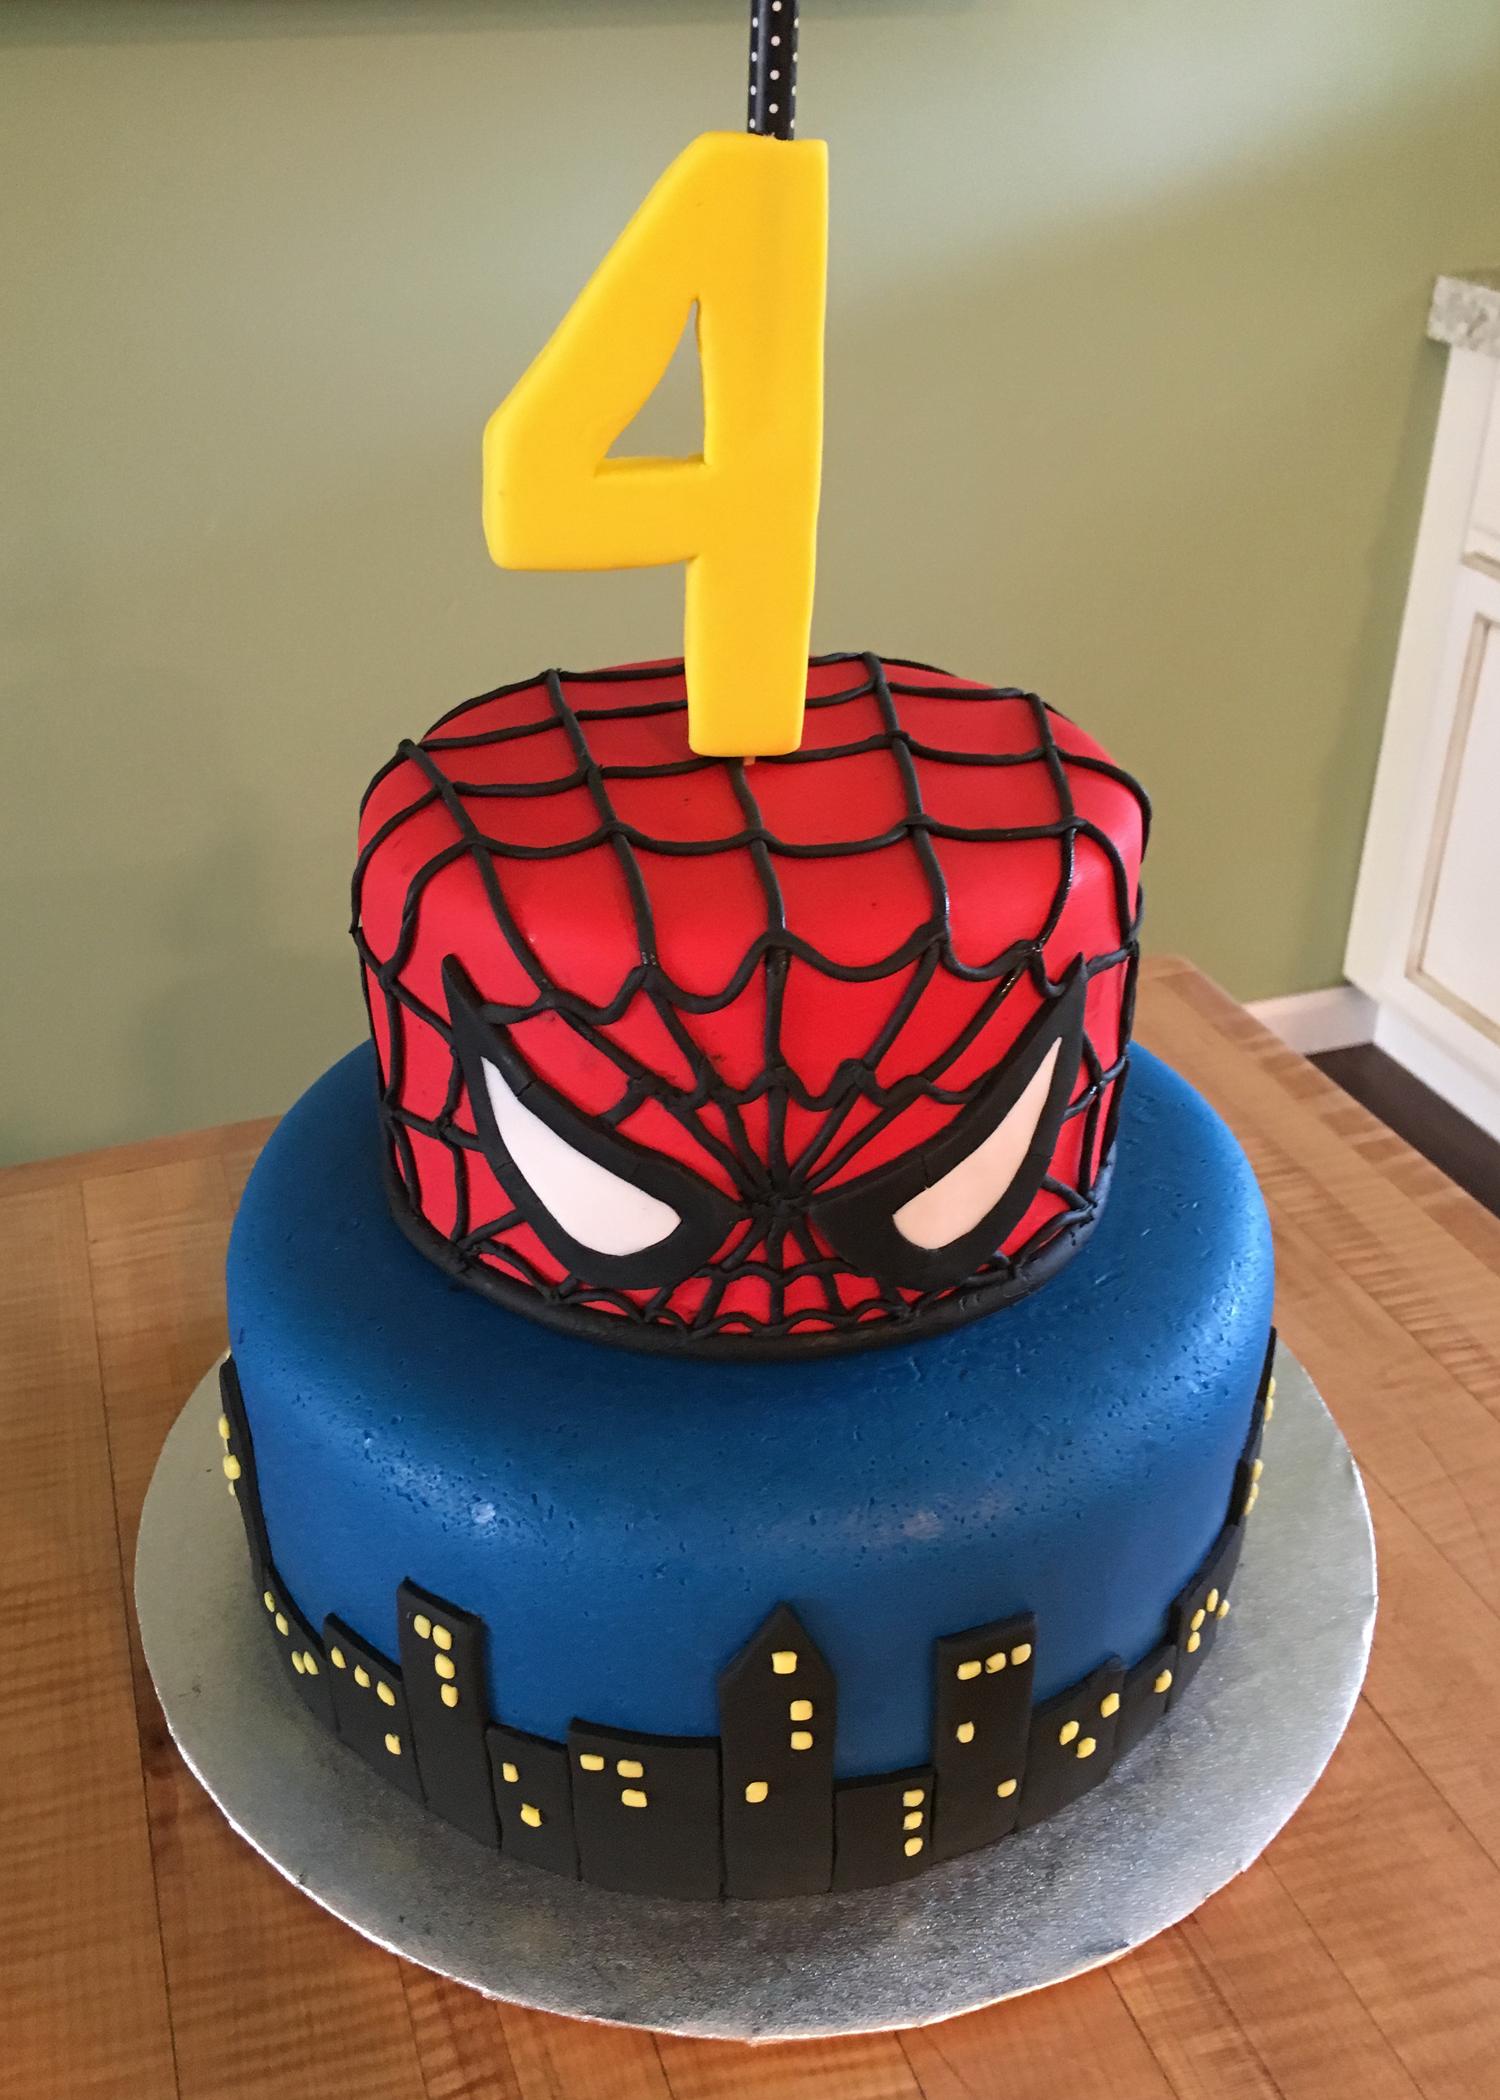 Who loves Spiderman? Jack!